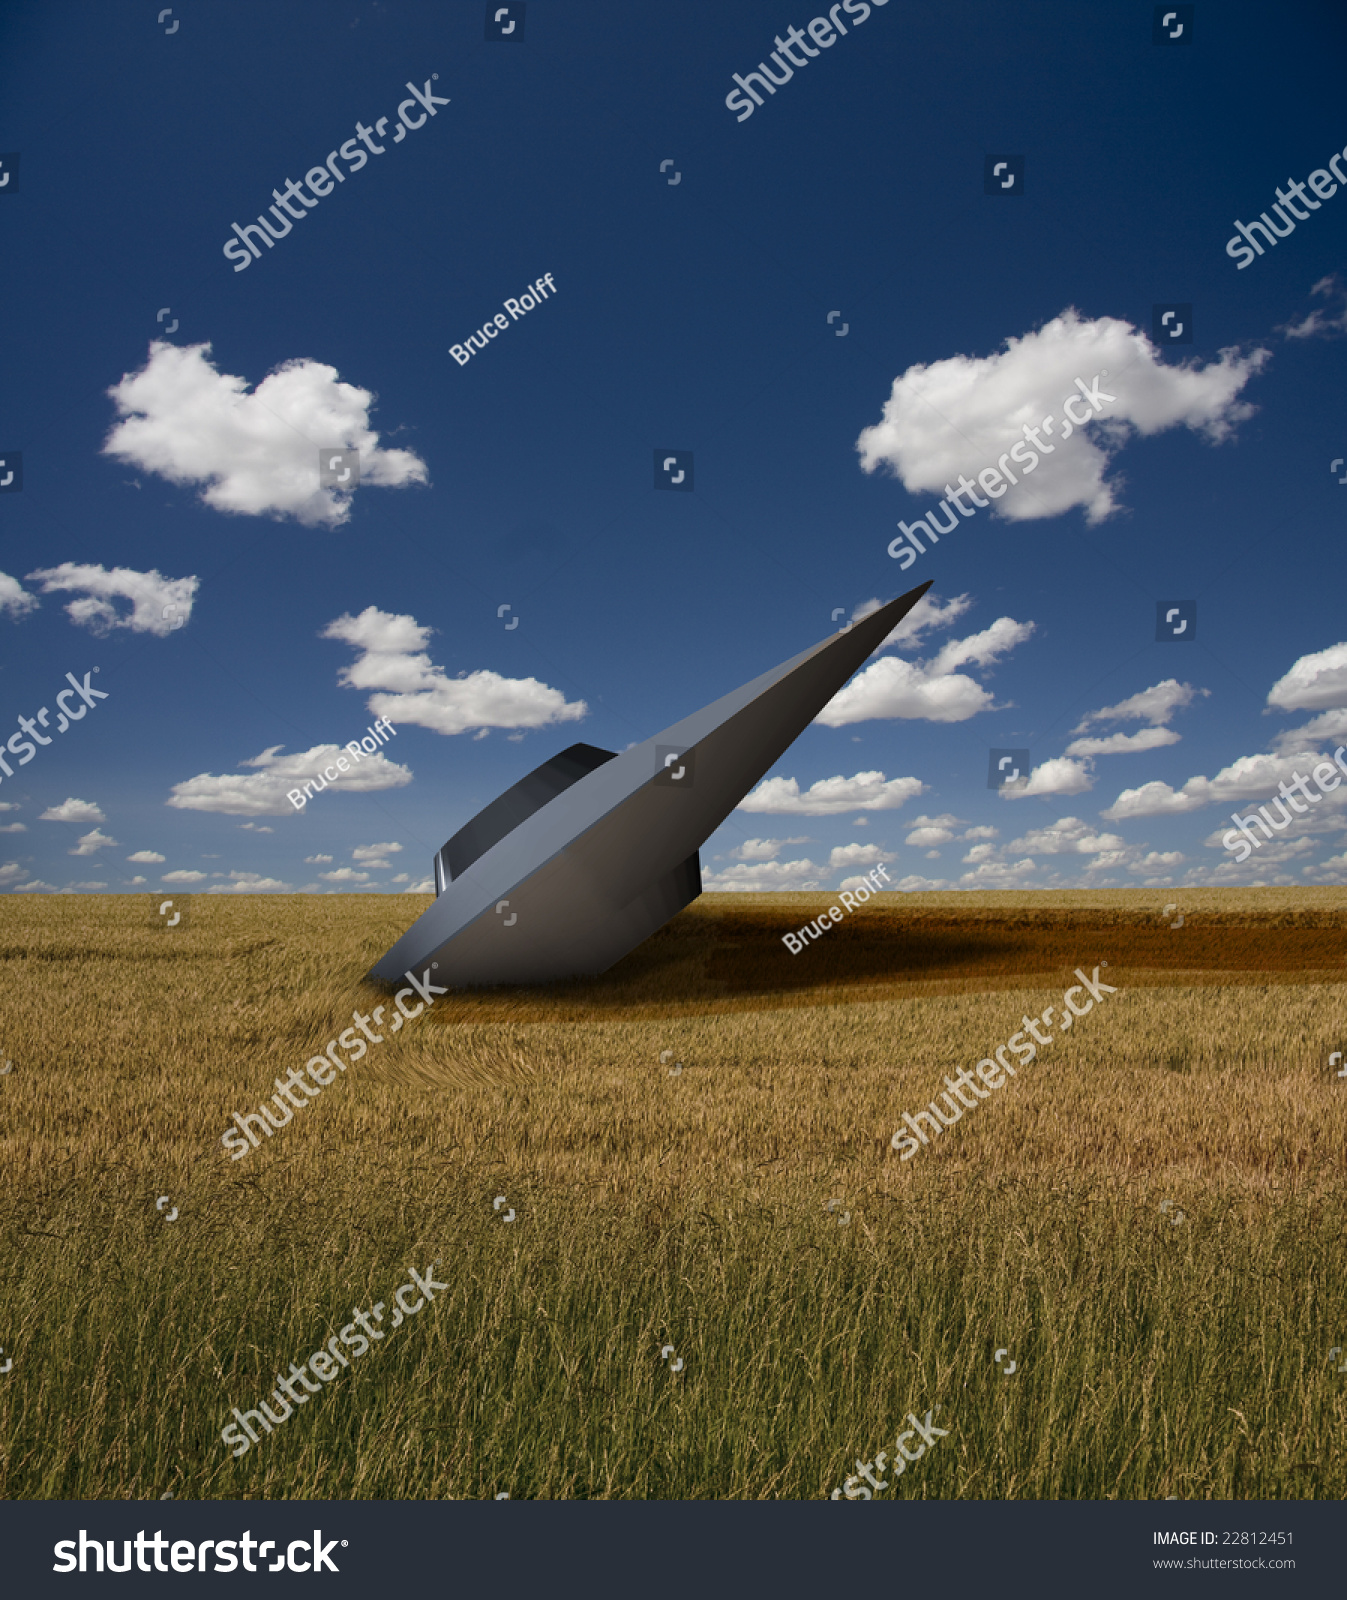 Ufo Crash Stock Photo 22812451 : Shutterstock